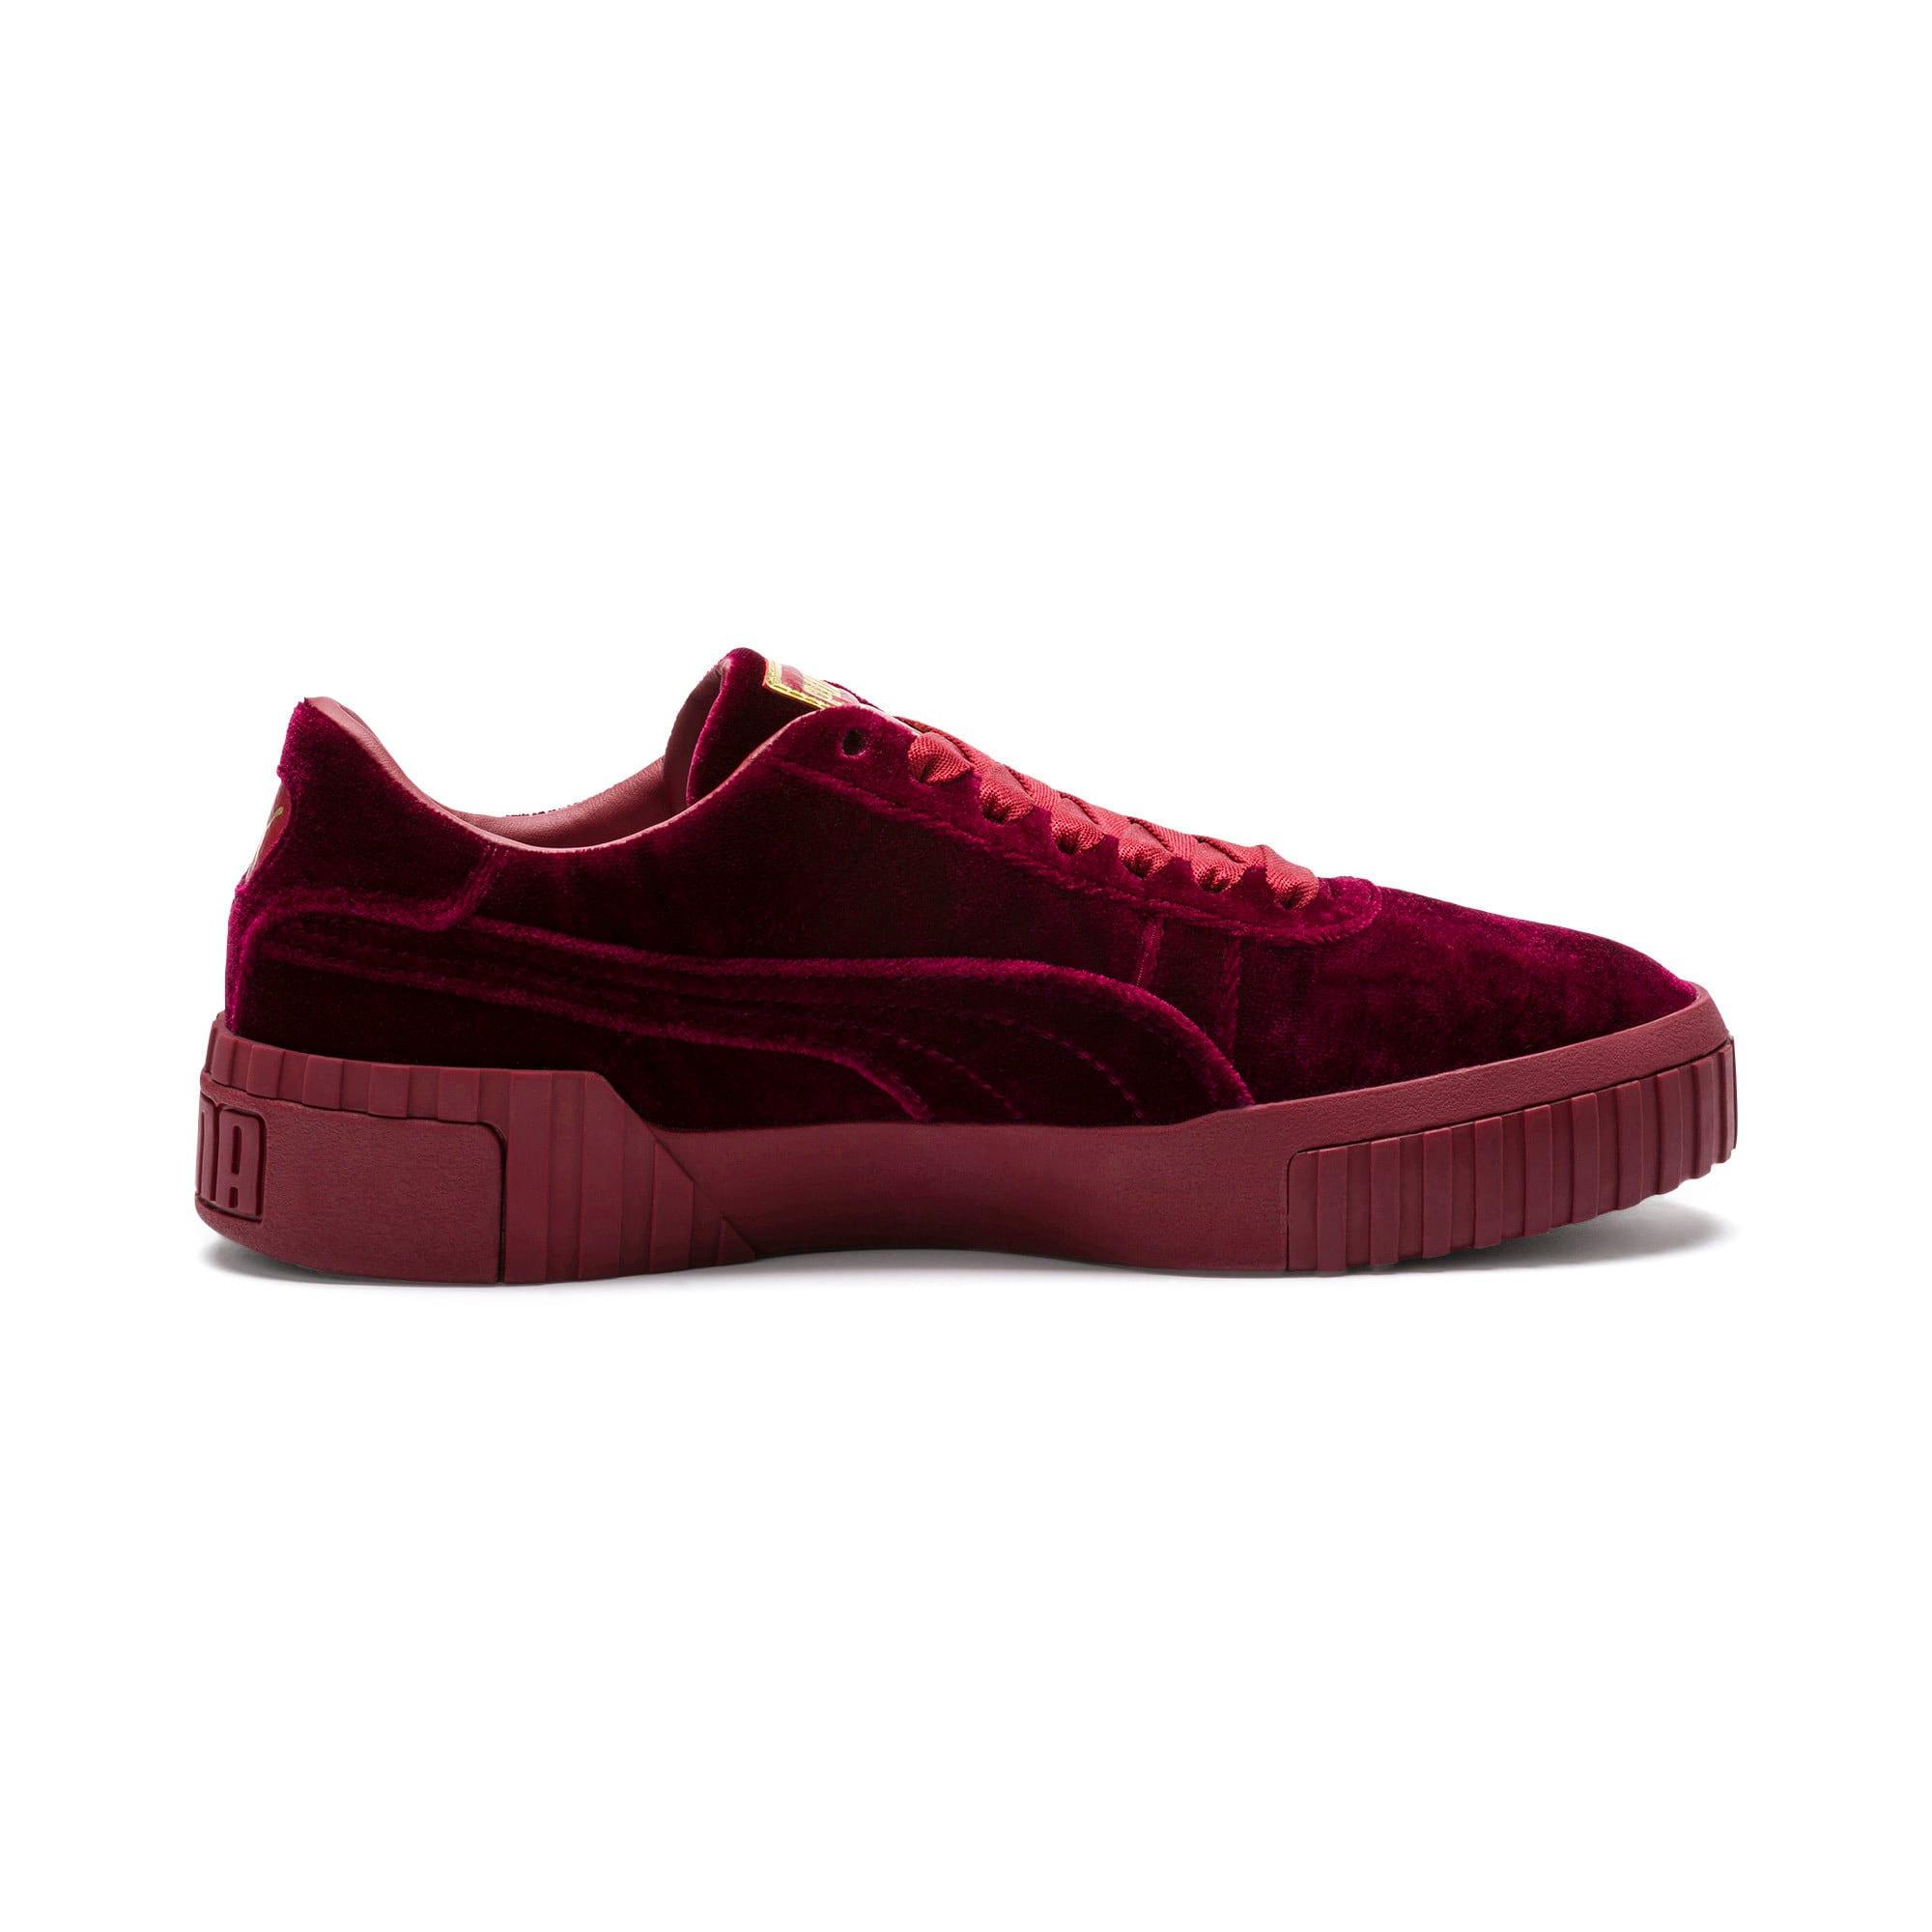 Miniatura 5 de Zapatos deportivosCali Velvetpara mujer, Tibetan Red-Tibetan Red, mediano